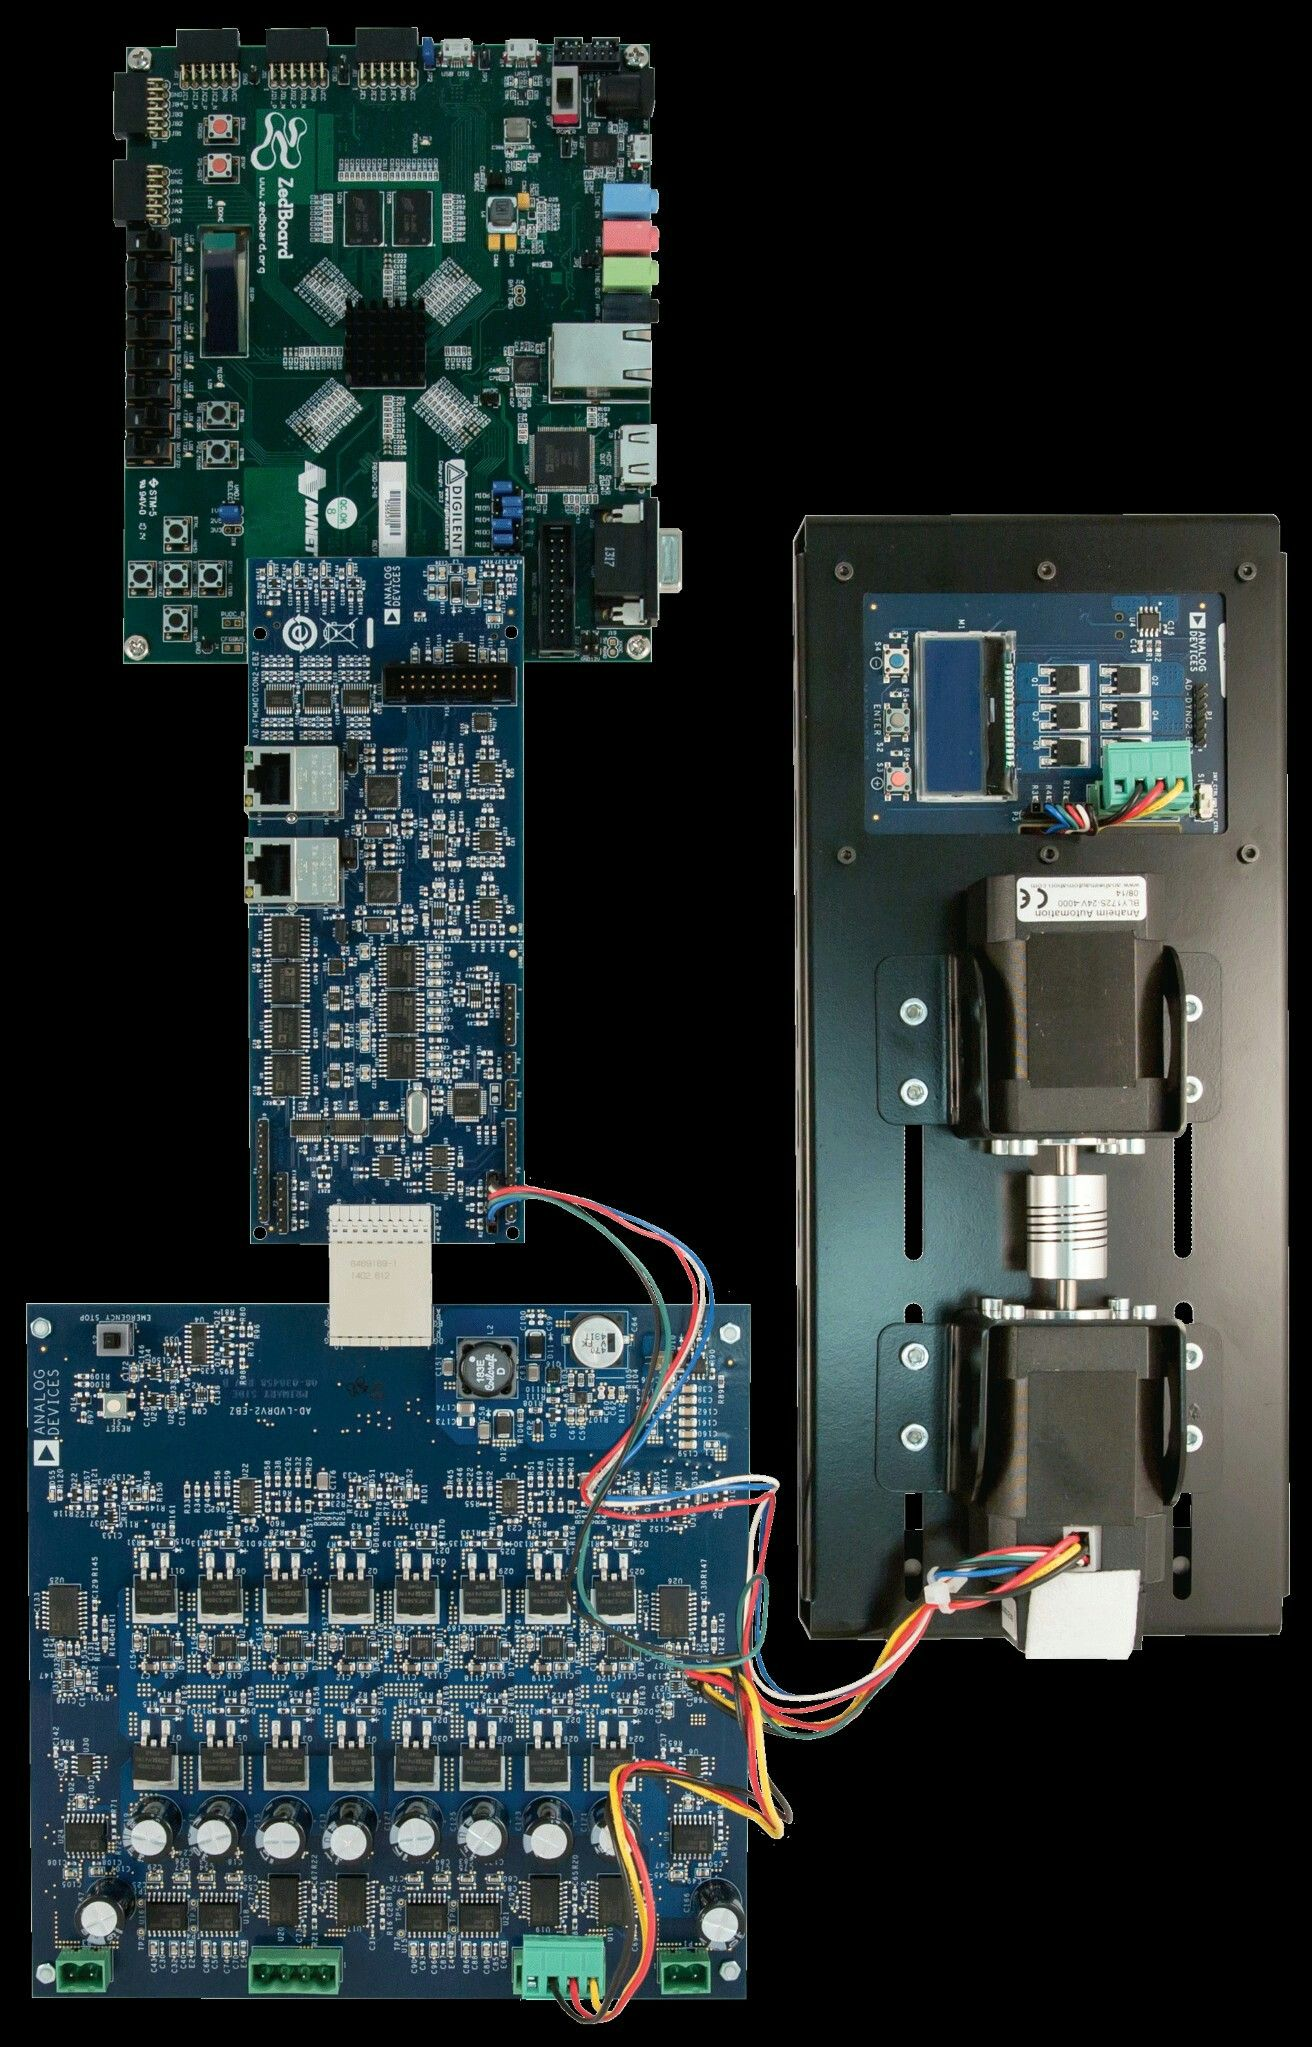 Hp Dv6000 Diagram Enthusiast Wiring Diagrams Keyboard For Circuit Pinwheel Automotive